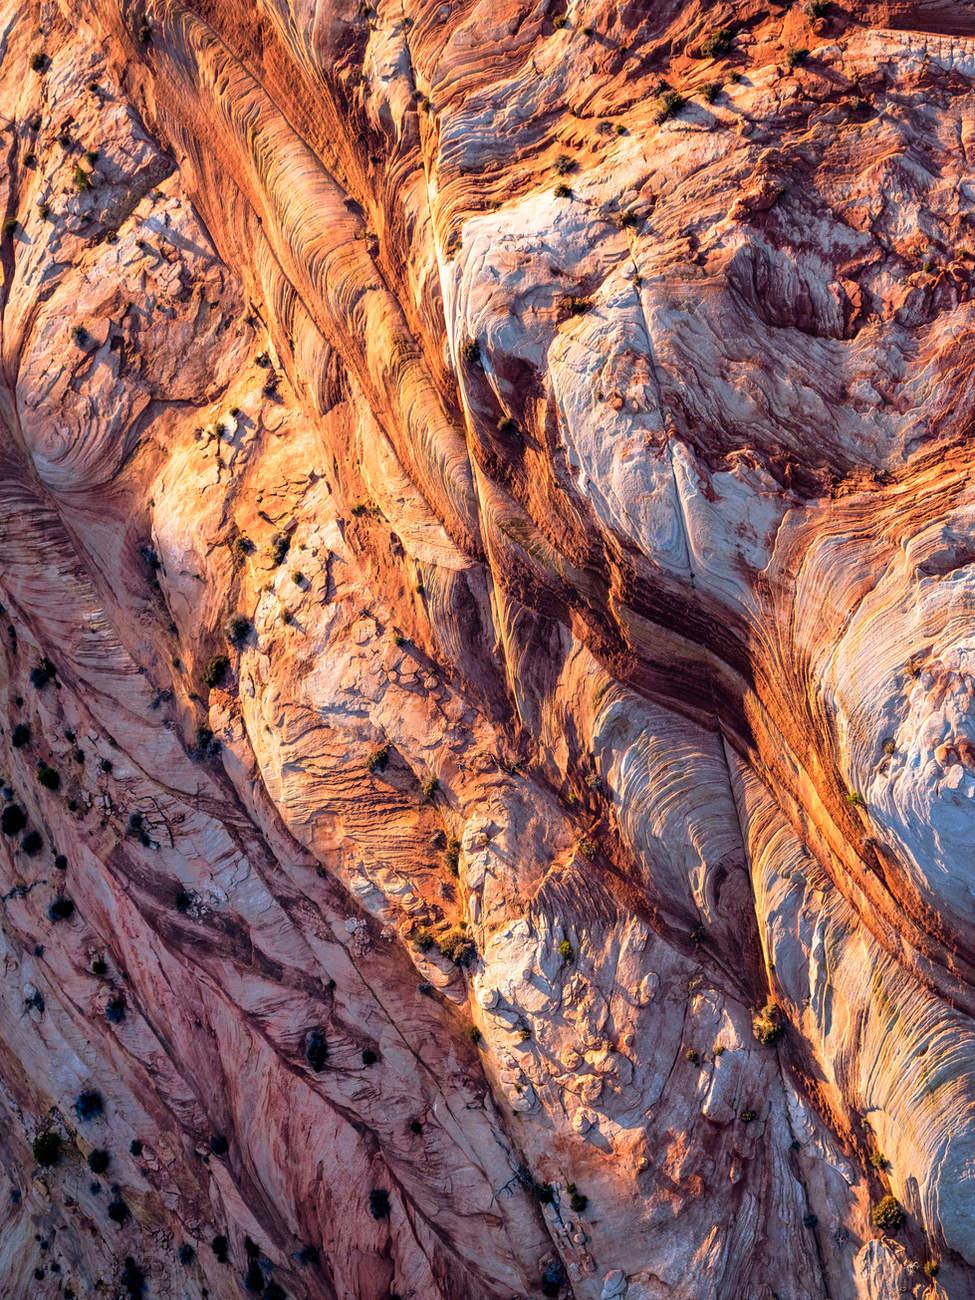 'Story Lines' - Zion National Park, Utah